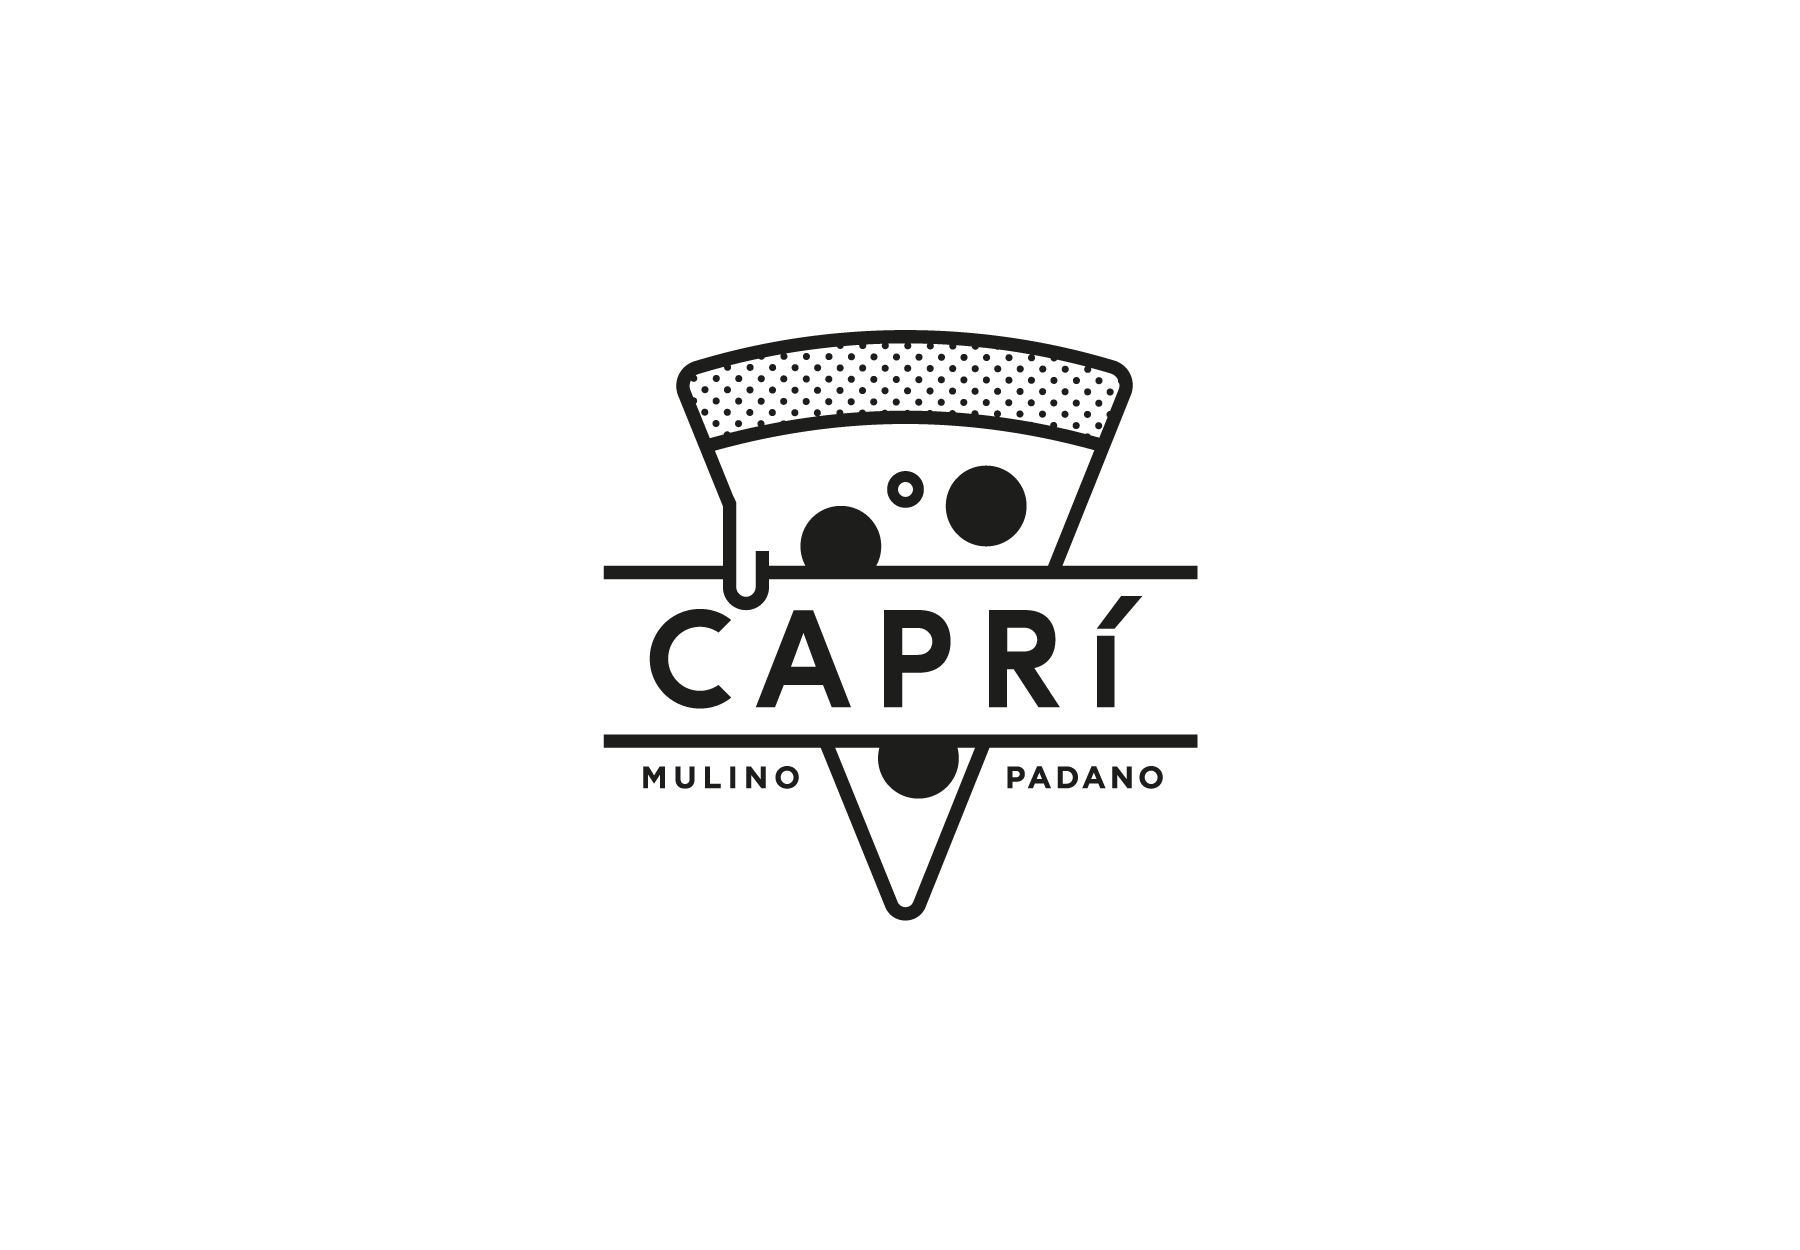 Pizza logo design - DryStudio